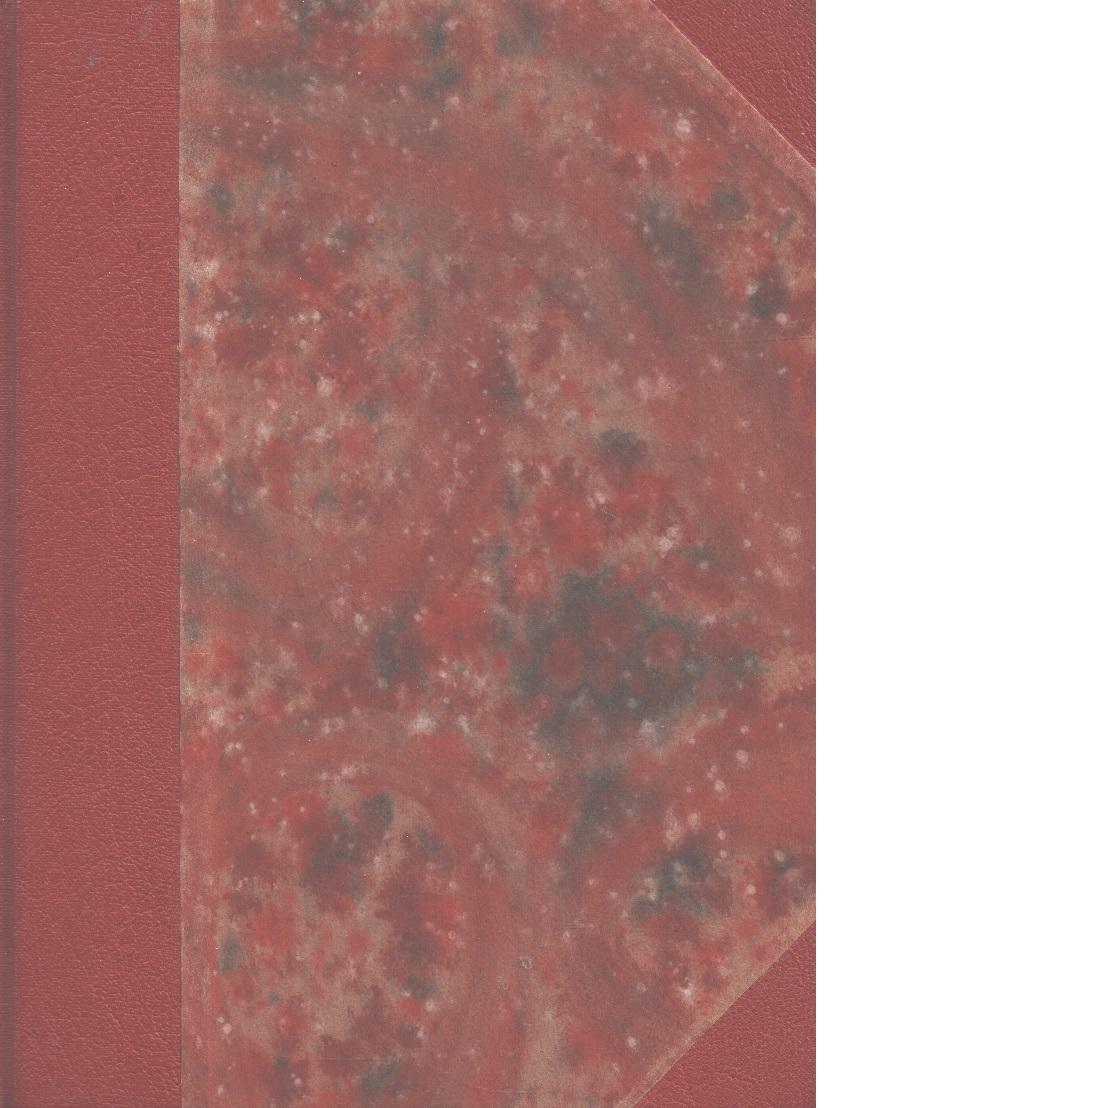 Trasiga sagor : prosa - Englund, Carl-emil